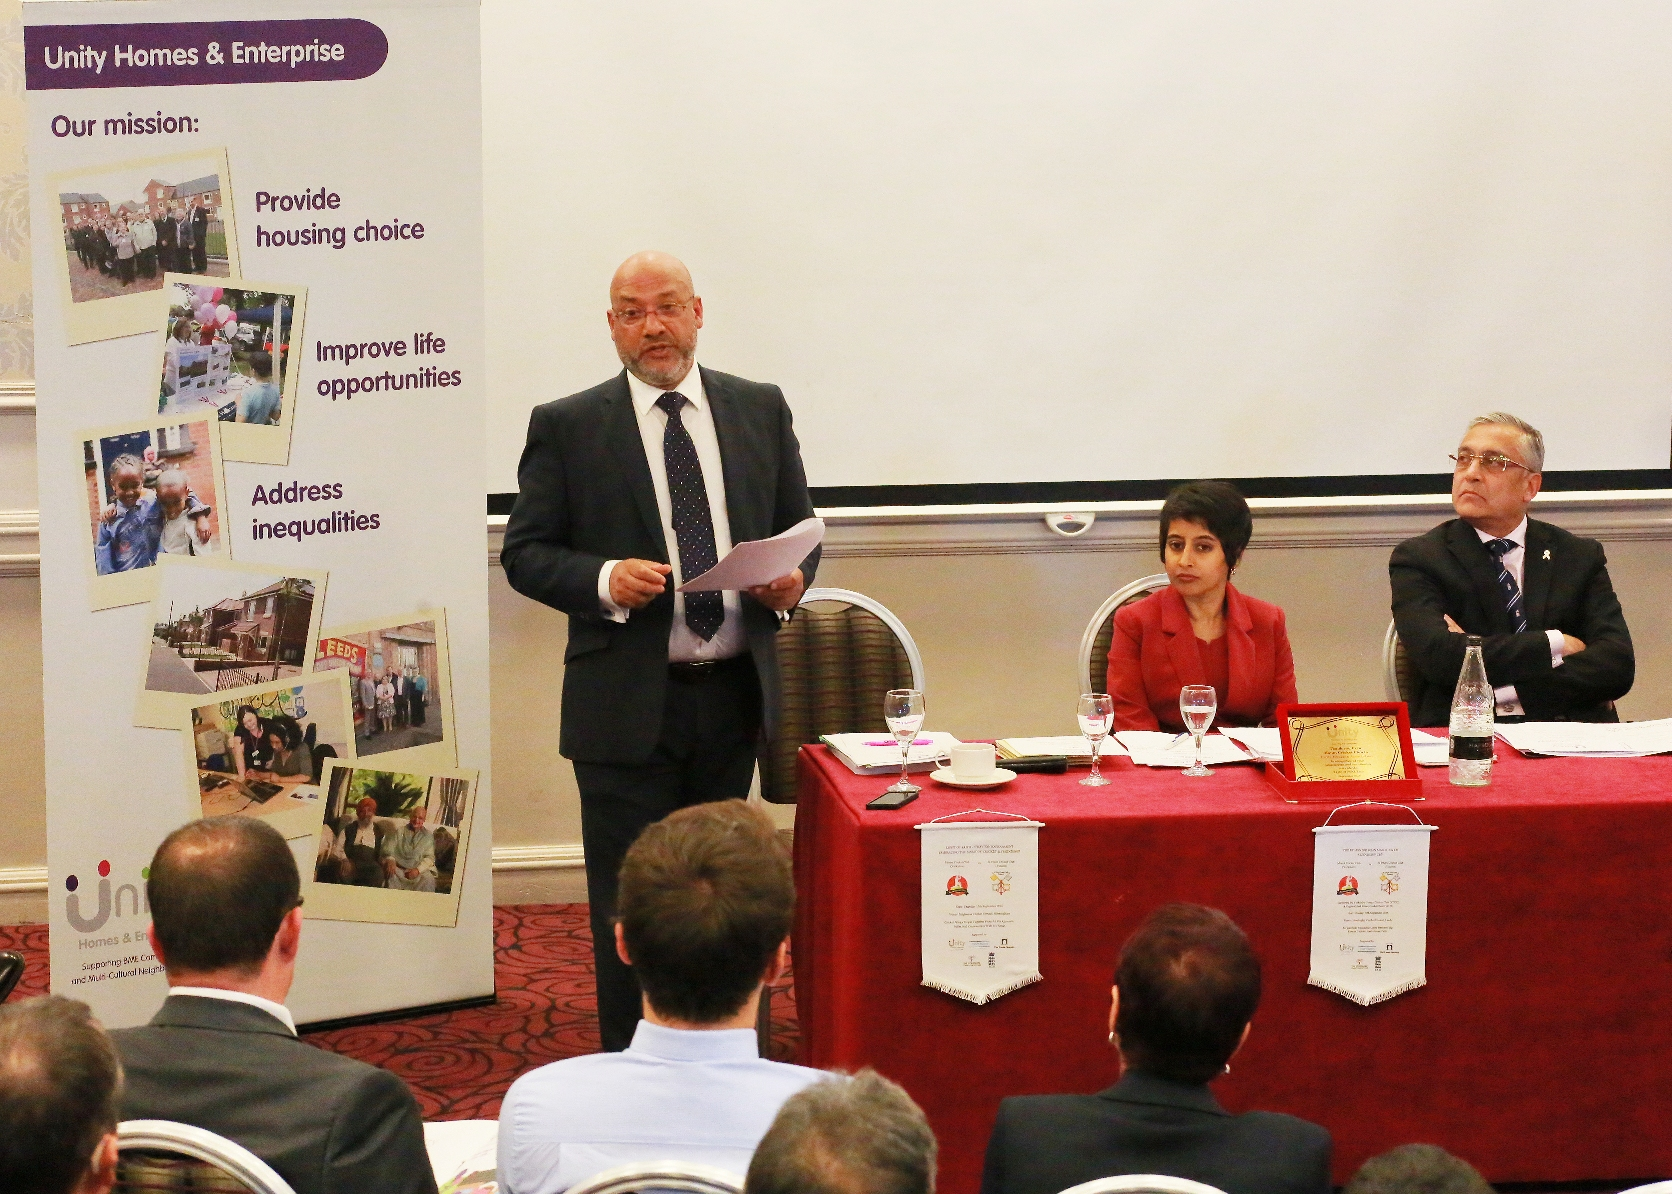 Chief executive Ali Akbor address the Unity Homes and Enterprise AGM at Headingley Cricket Ground